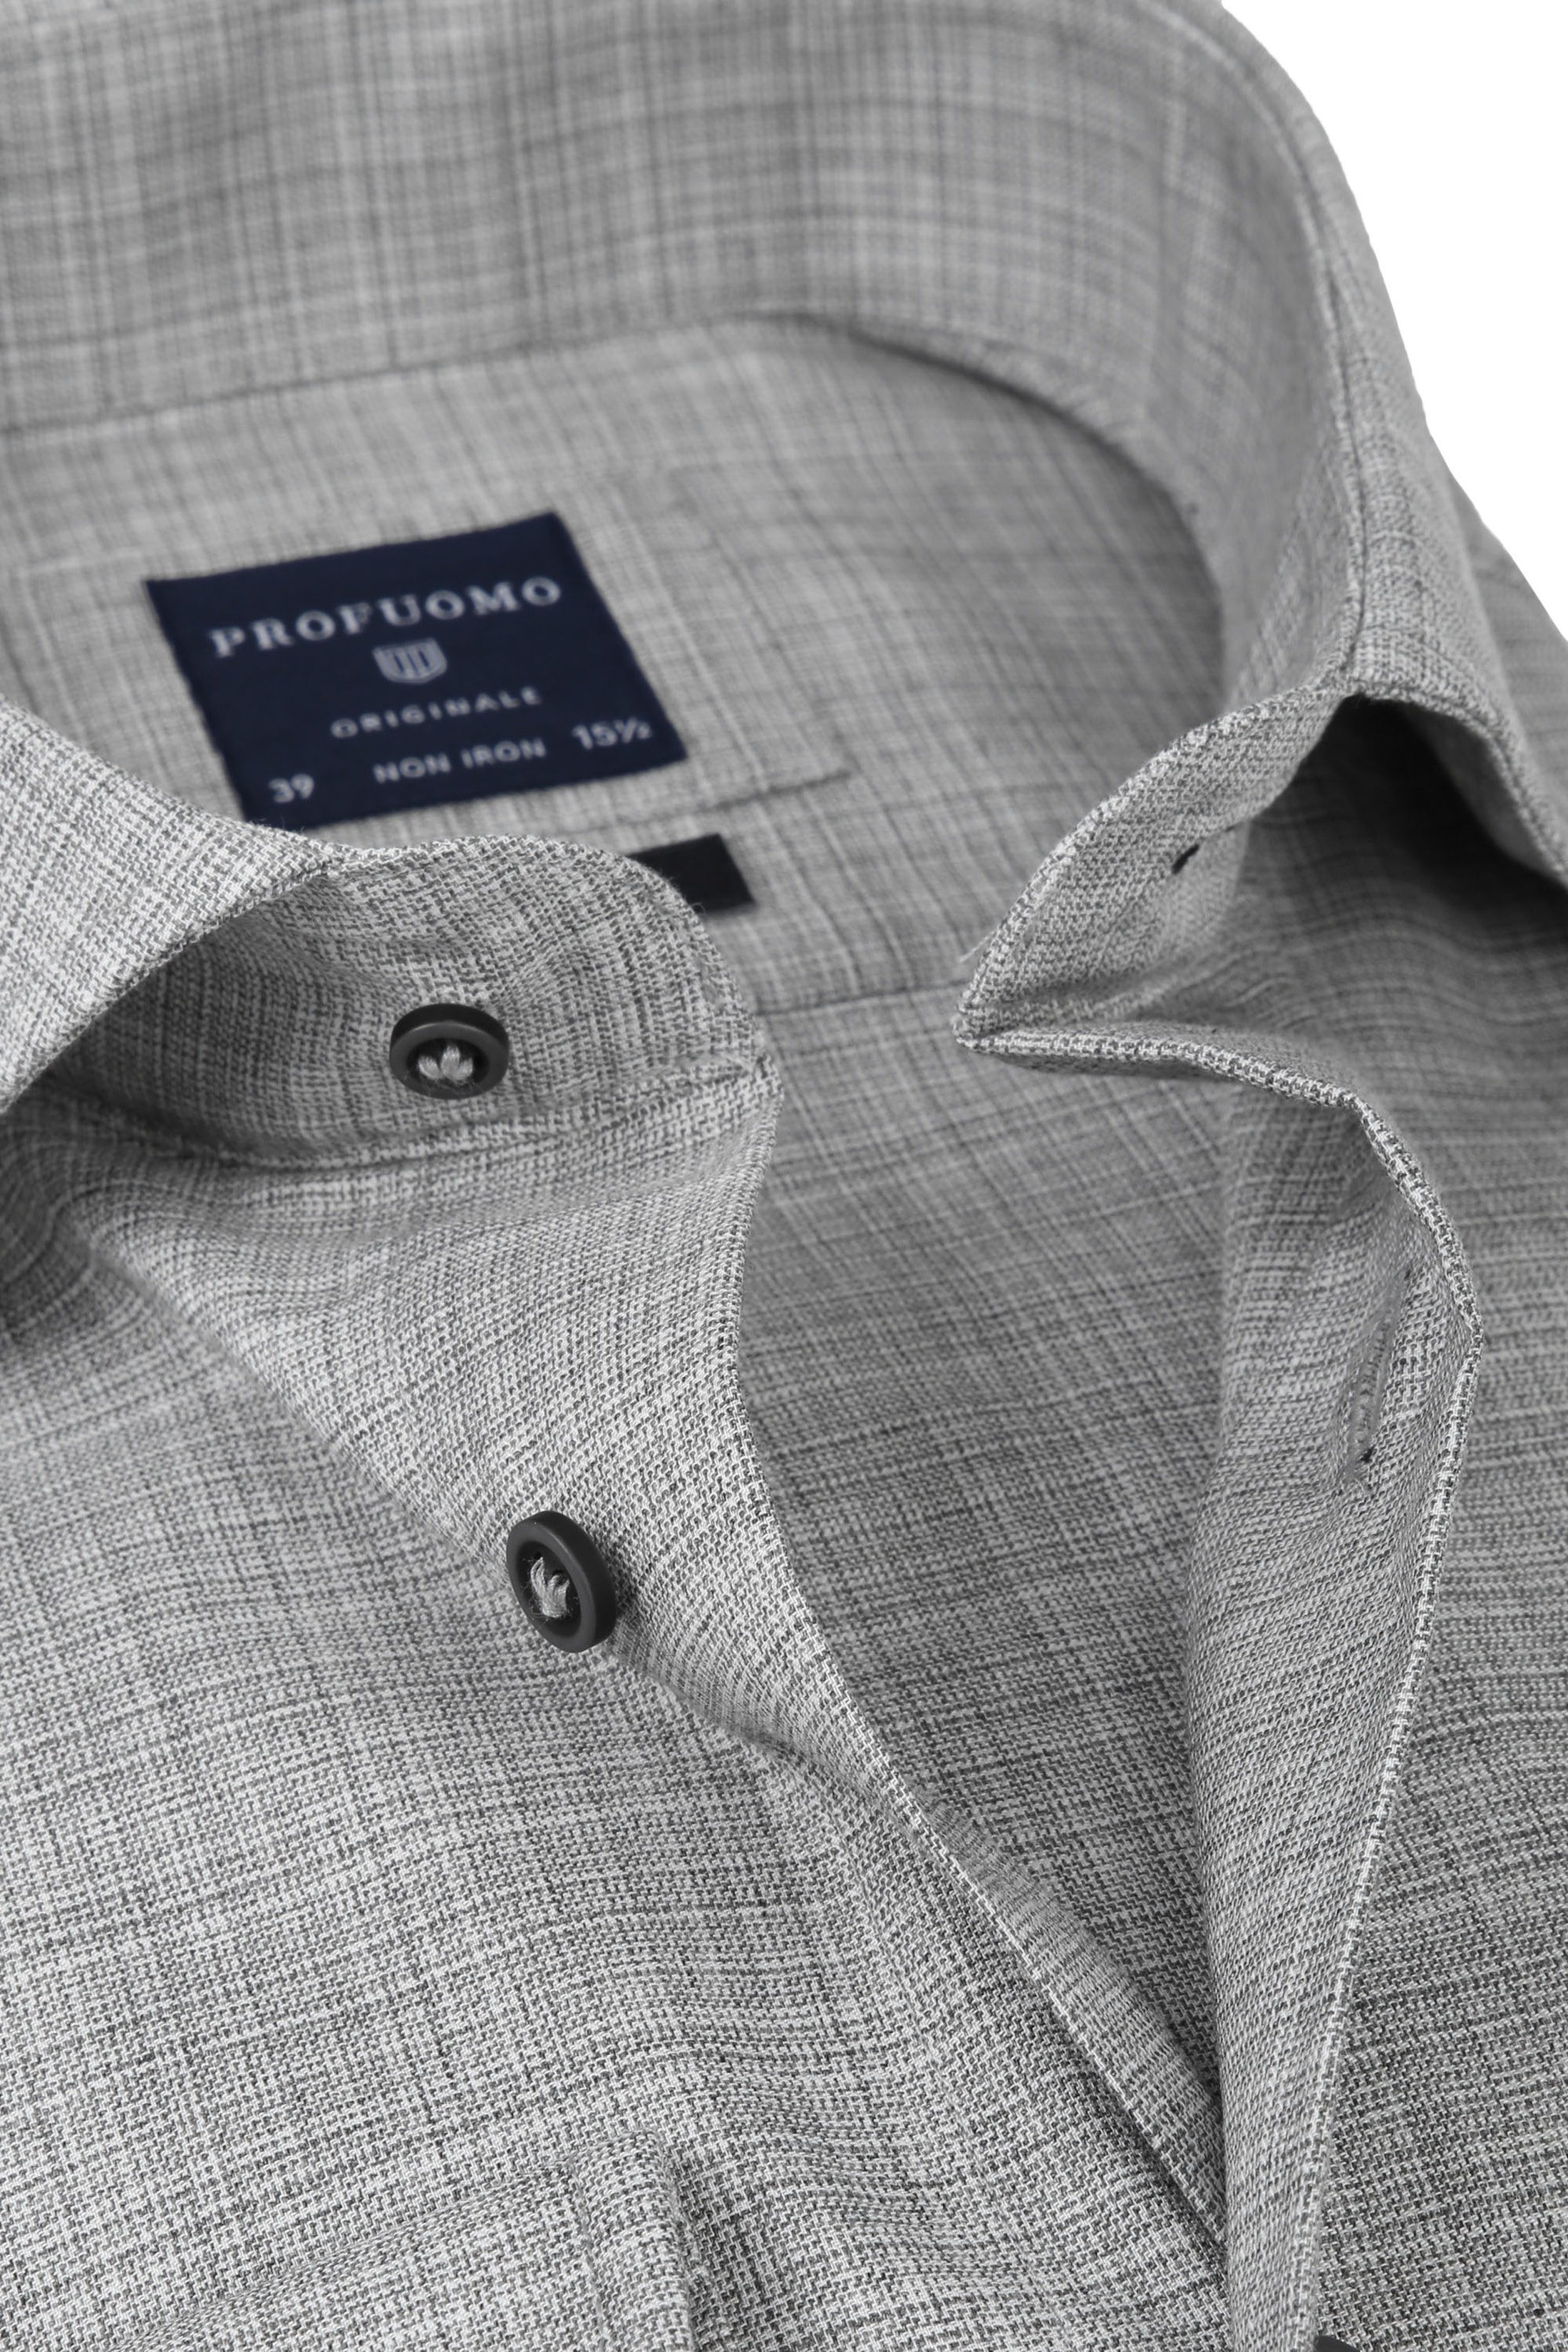 Profuomo Overhemd CAW Melange Grijs foto 1